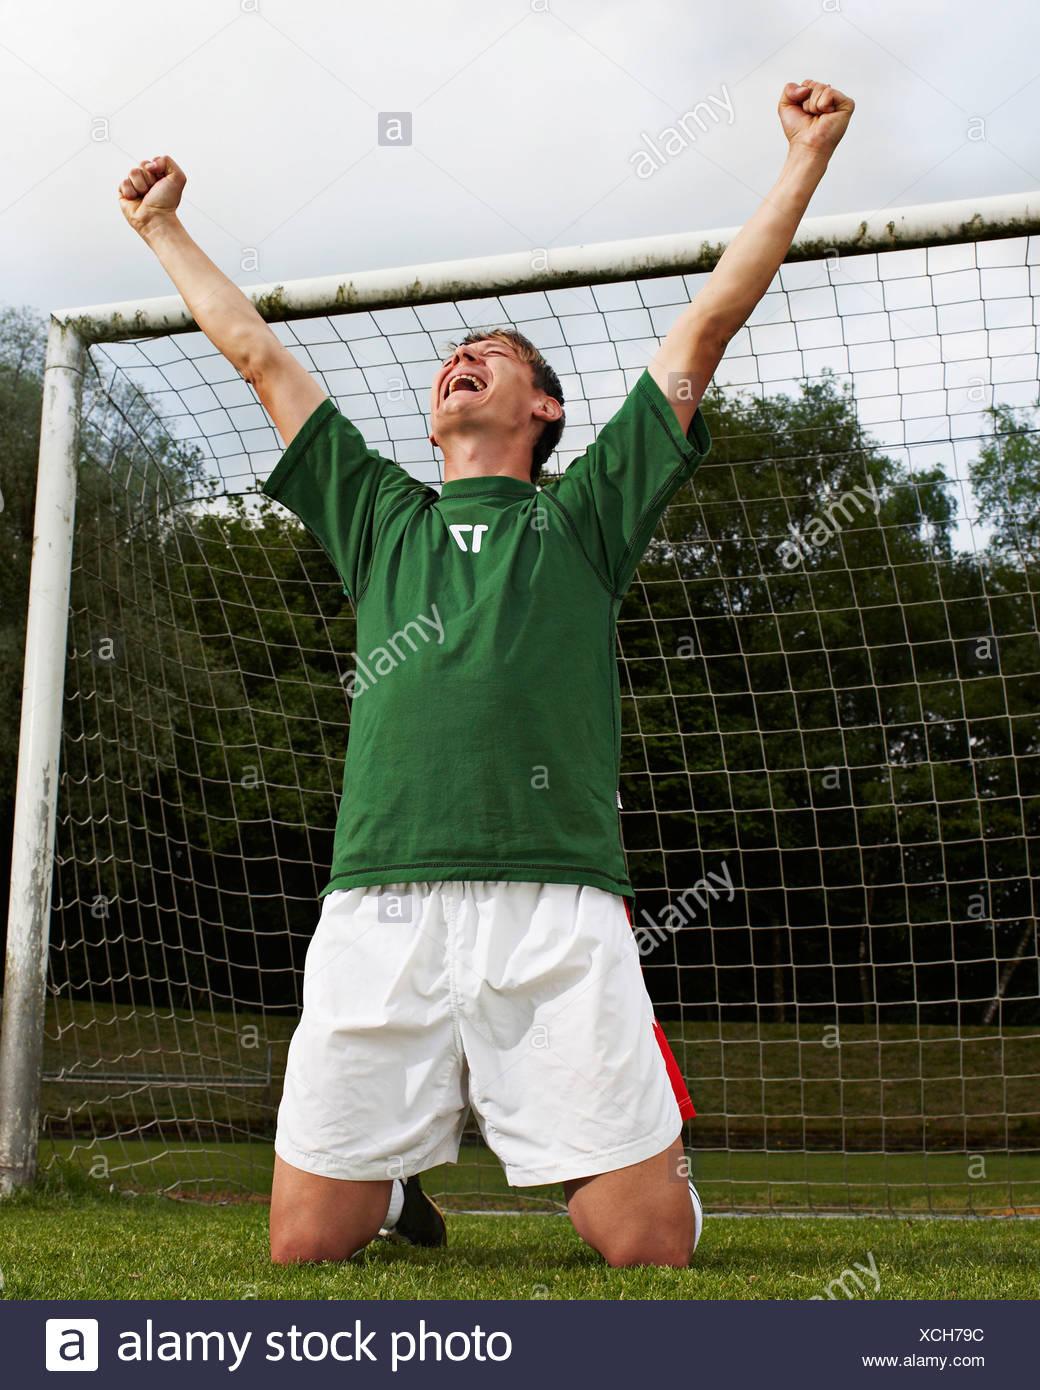 Soccer player celebrating on field - Stock Image